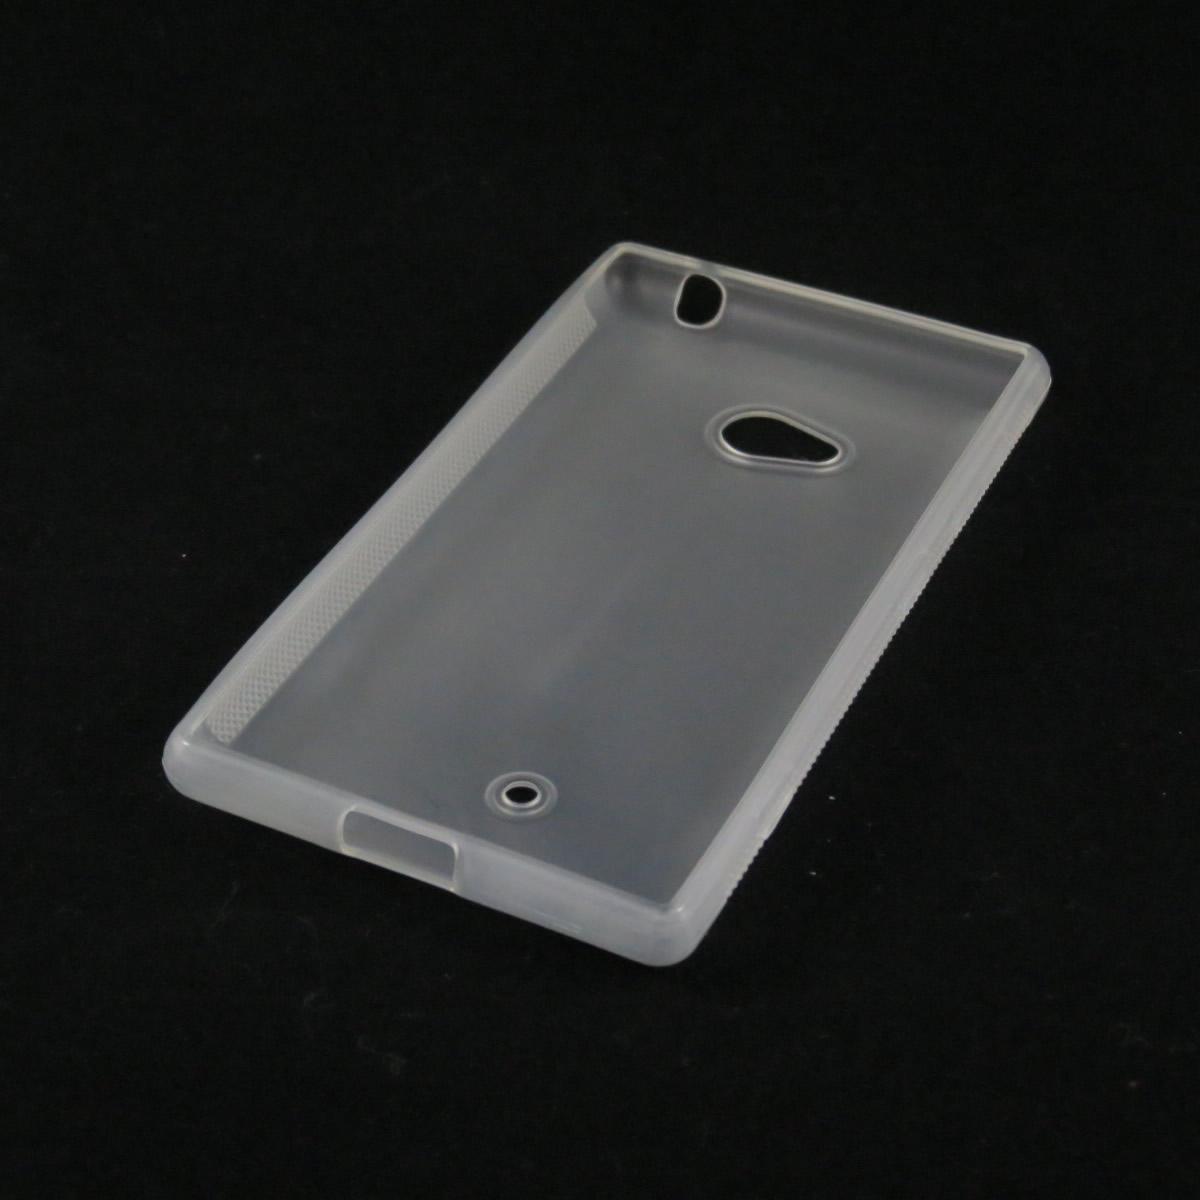 Capa Nokia Lumia 720 - Branca Flexível TPU Antiderrapante